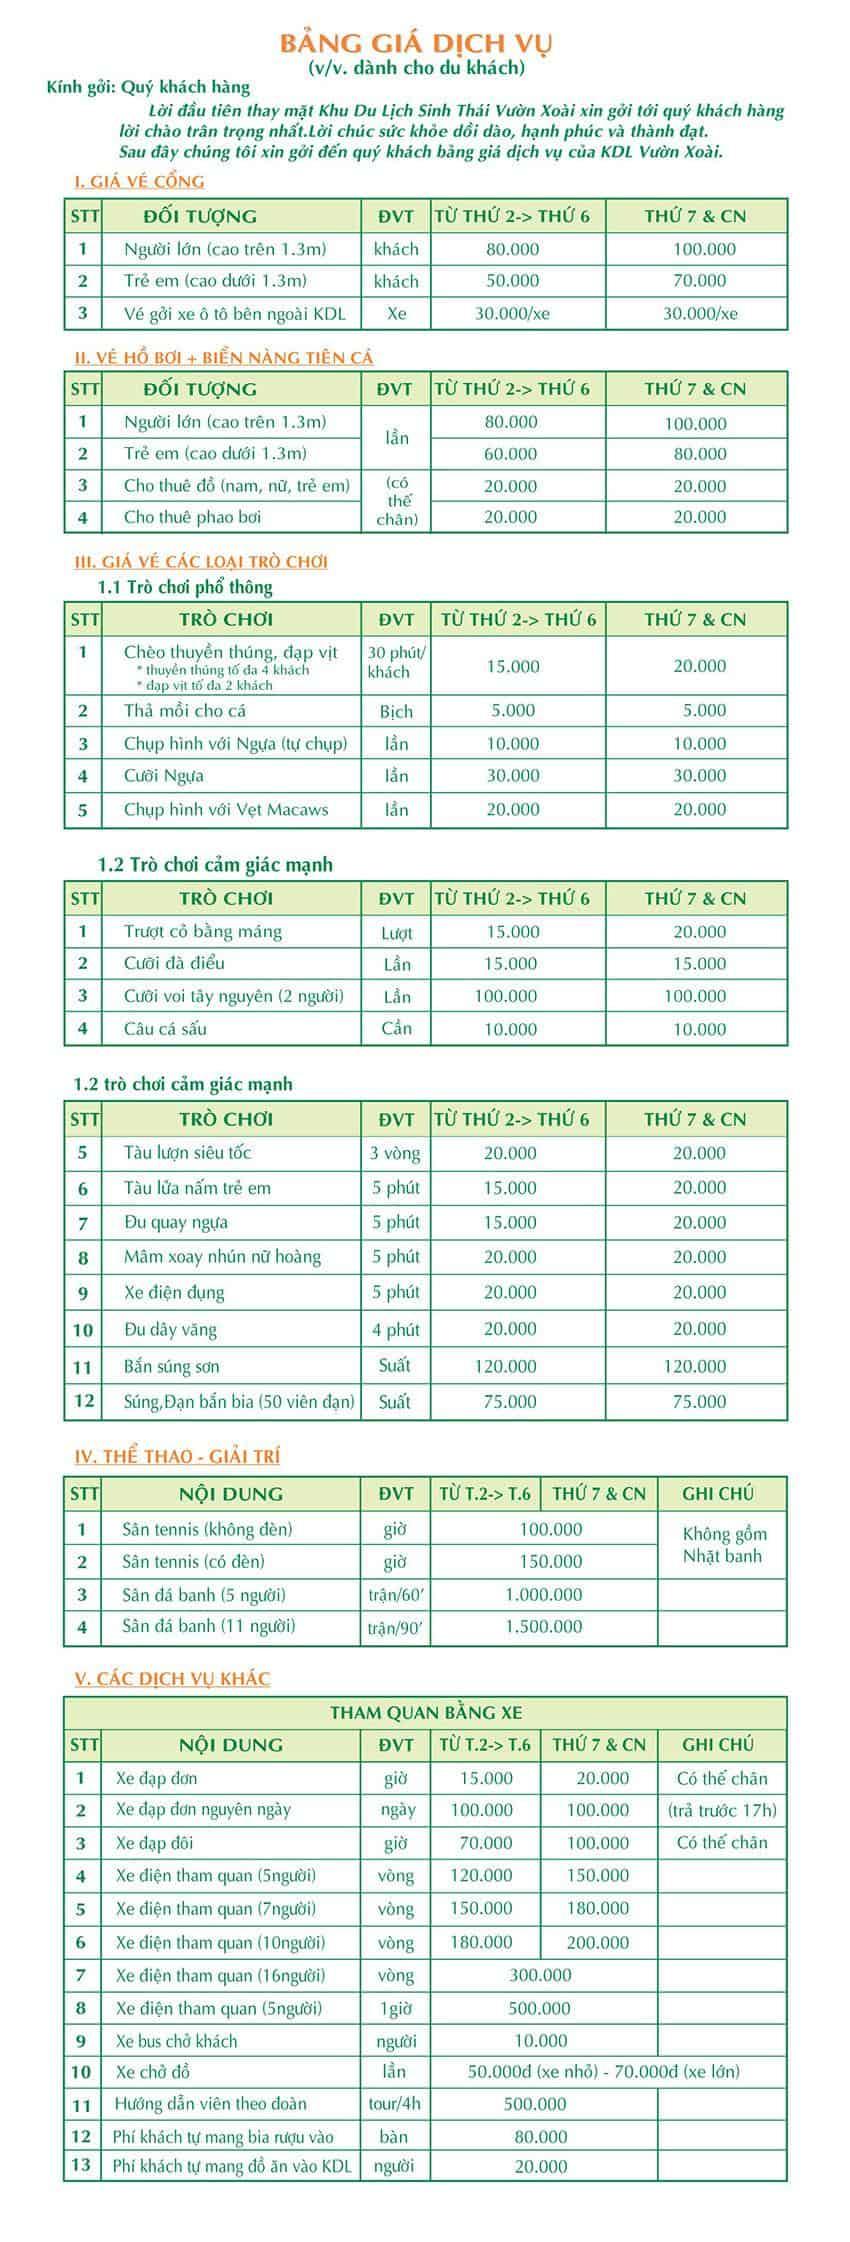 The price list of services at Vuon Xoai tourist site